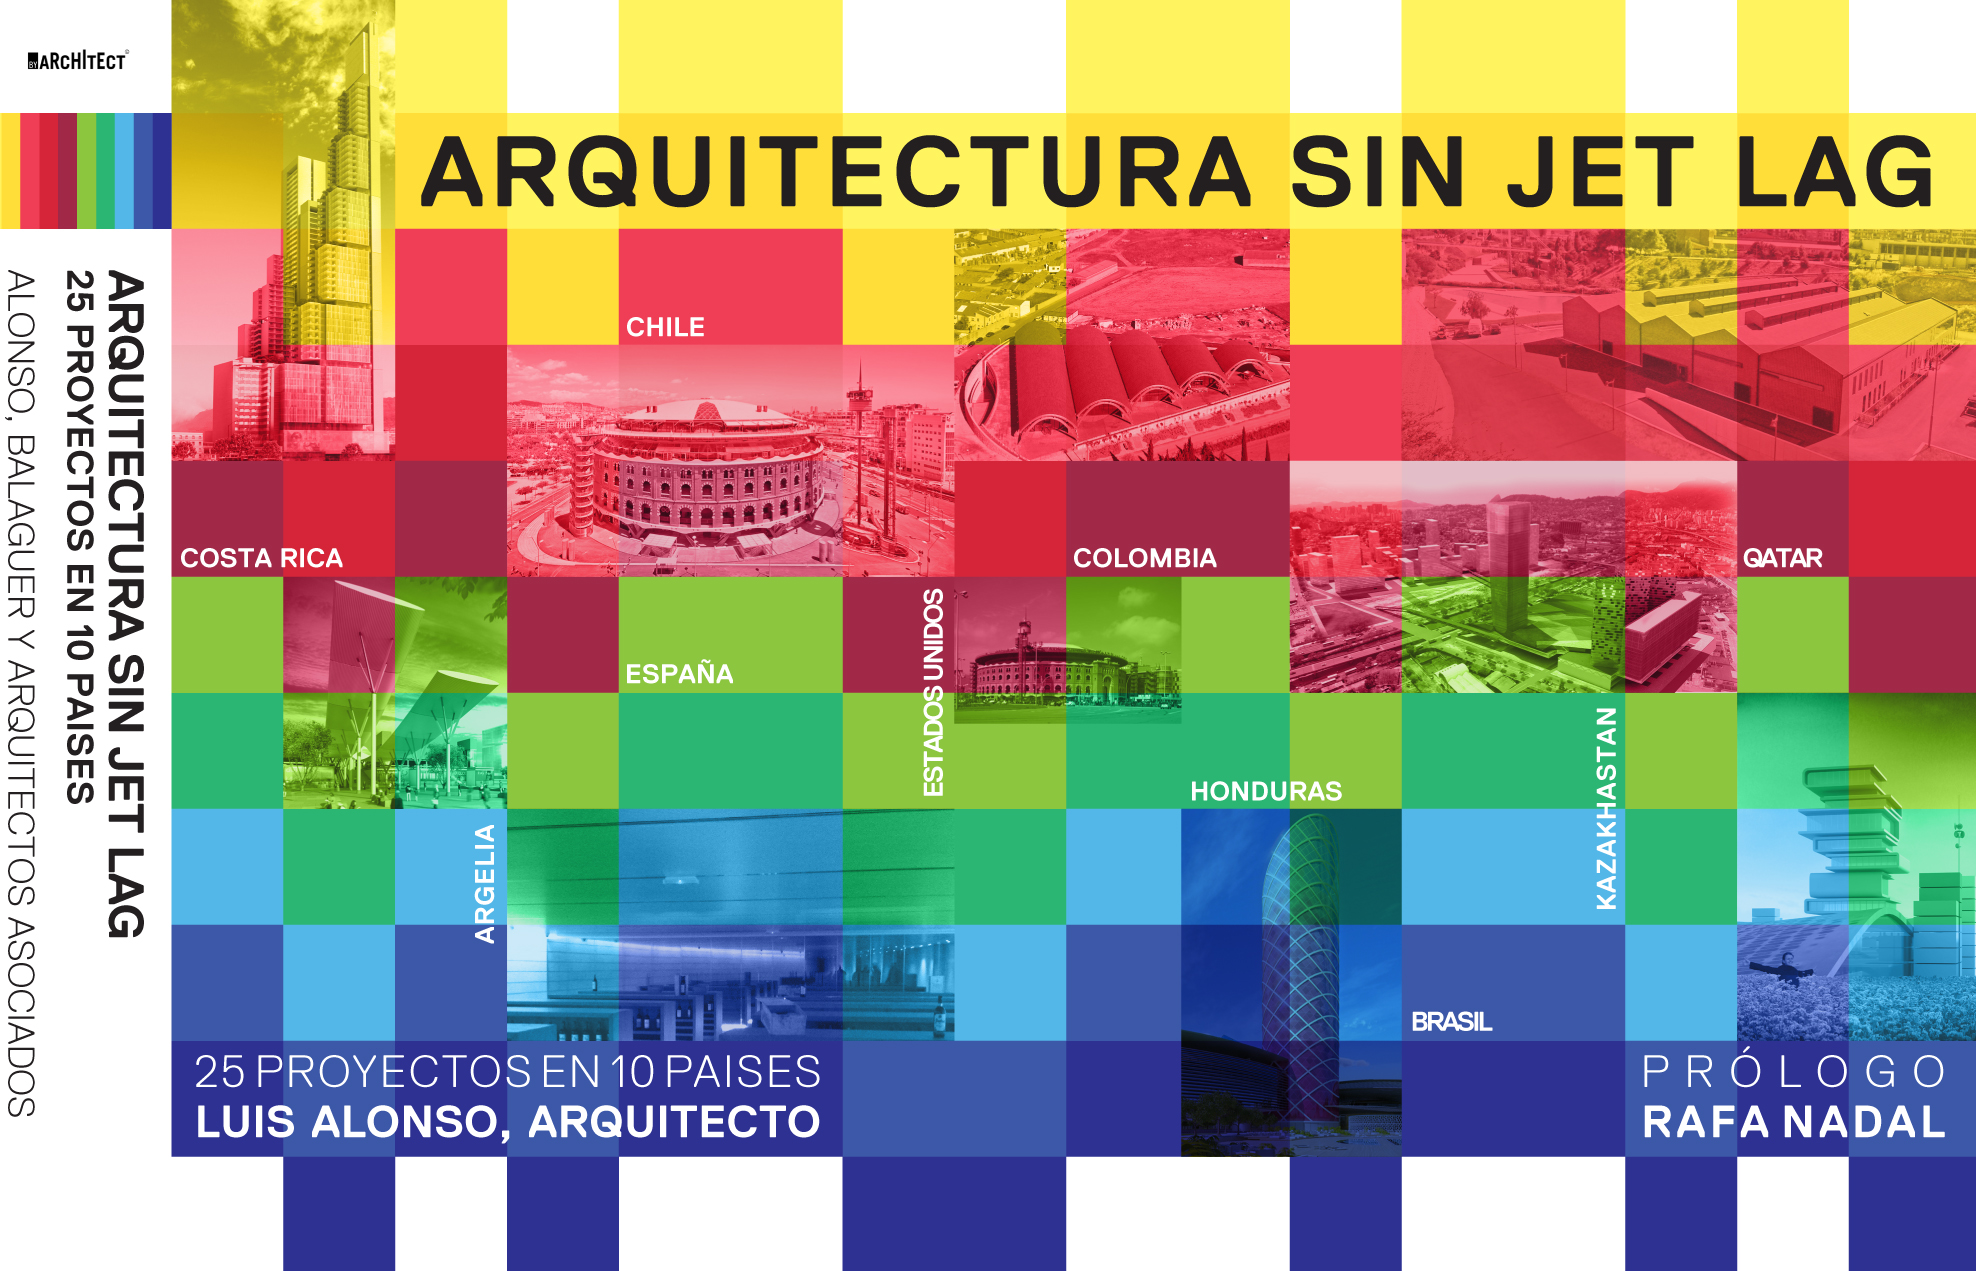 arquitectura sin jet lag 2 1.jpg